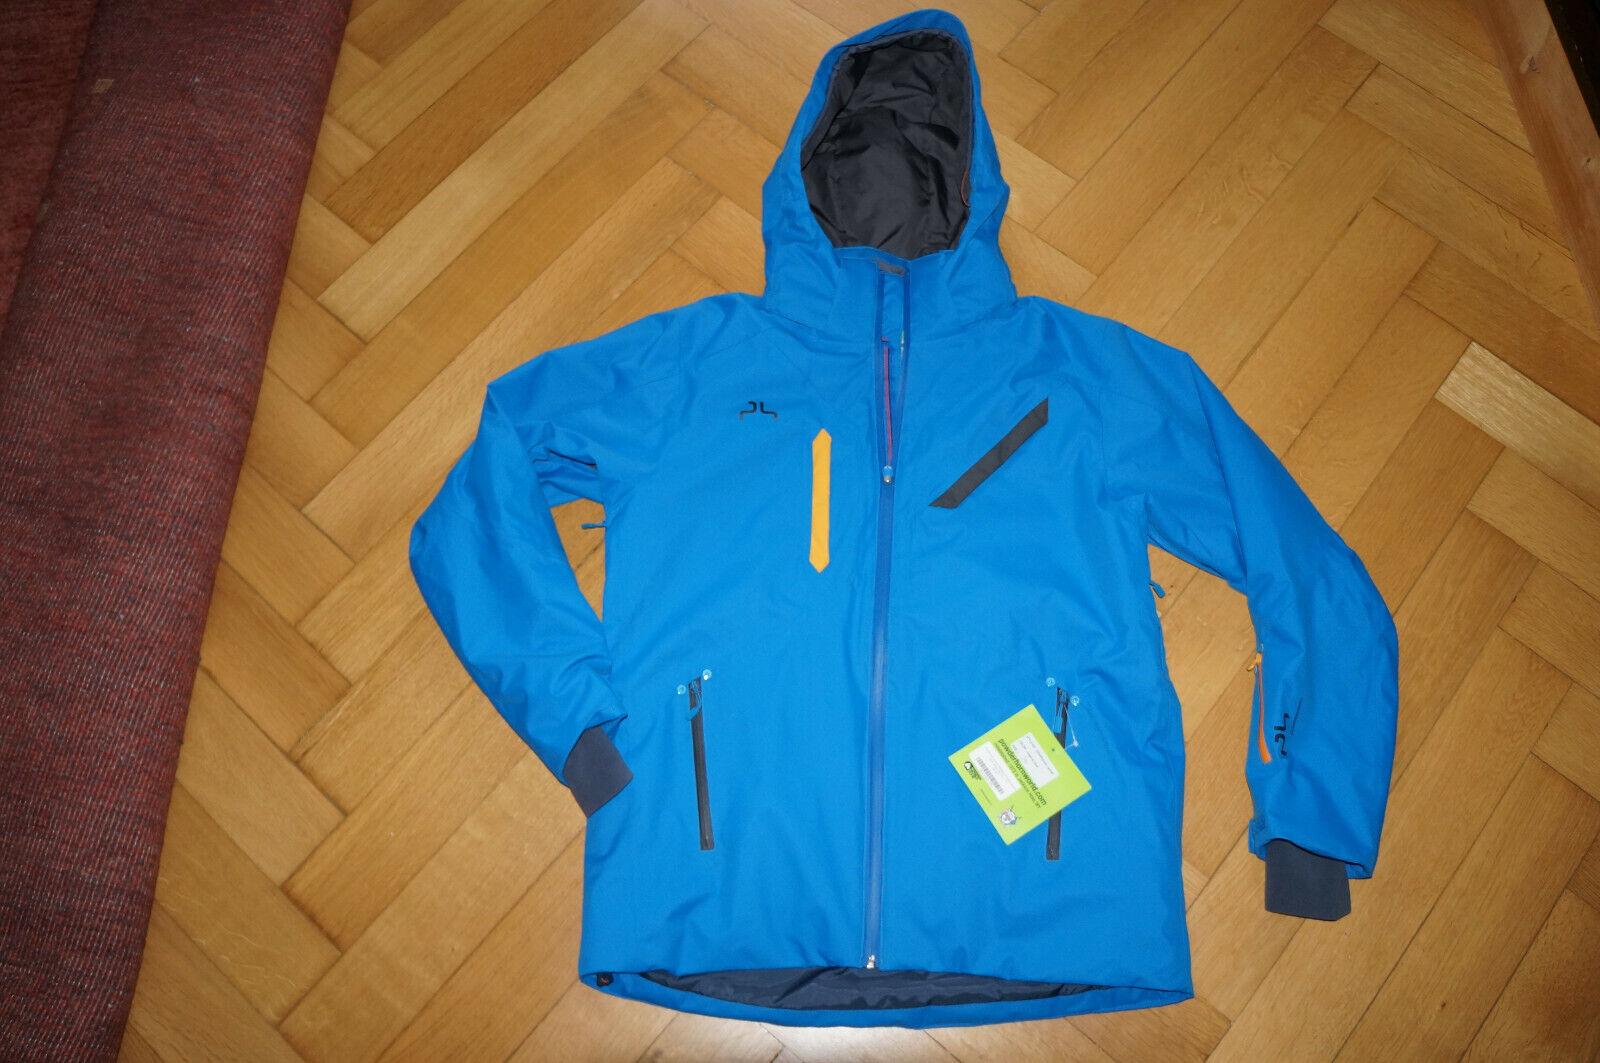 Powderhorn Dalton insulated Skijacke Snowboard Jacke Herren Größe L neu